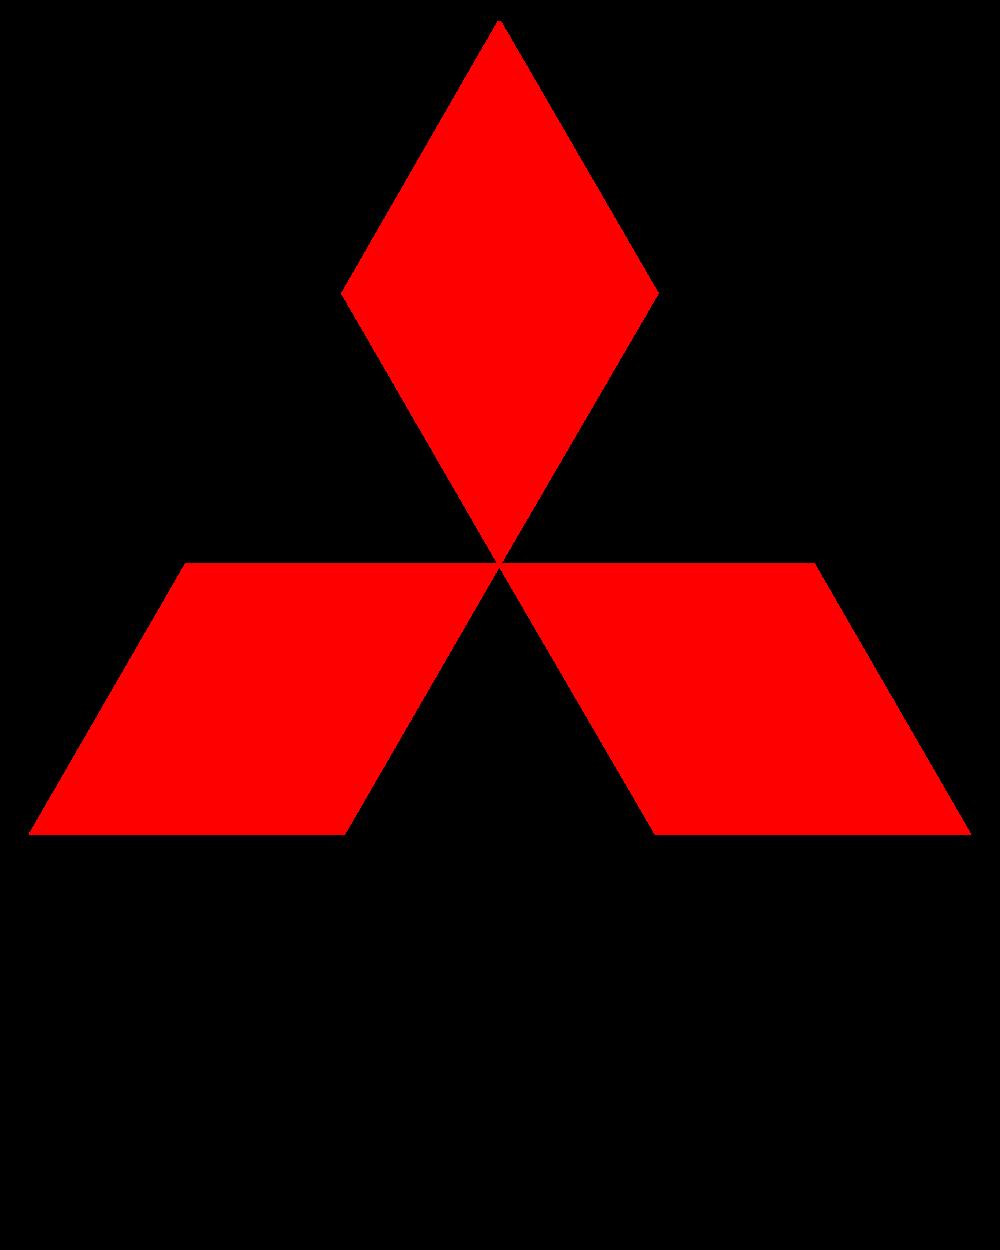 Mitsubishi-logo-2000x2500.png